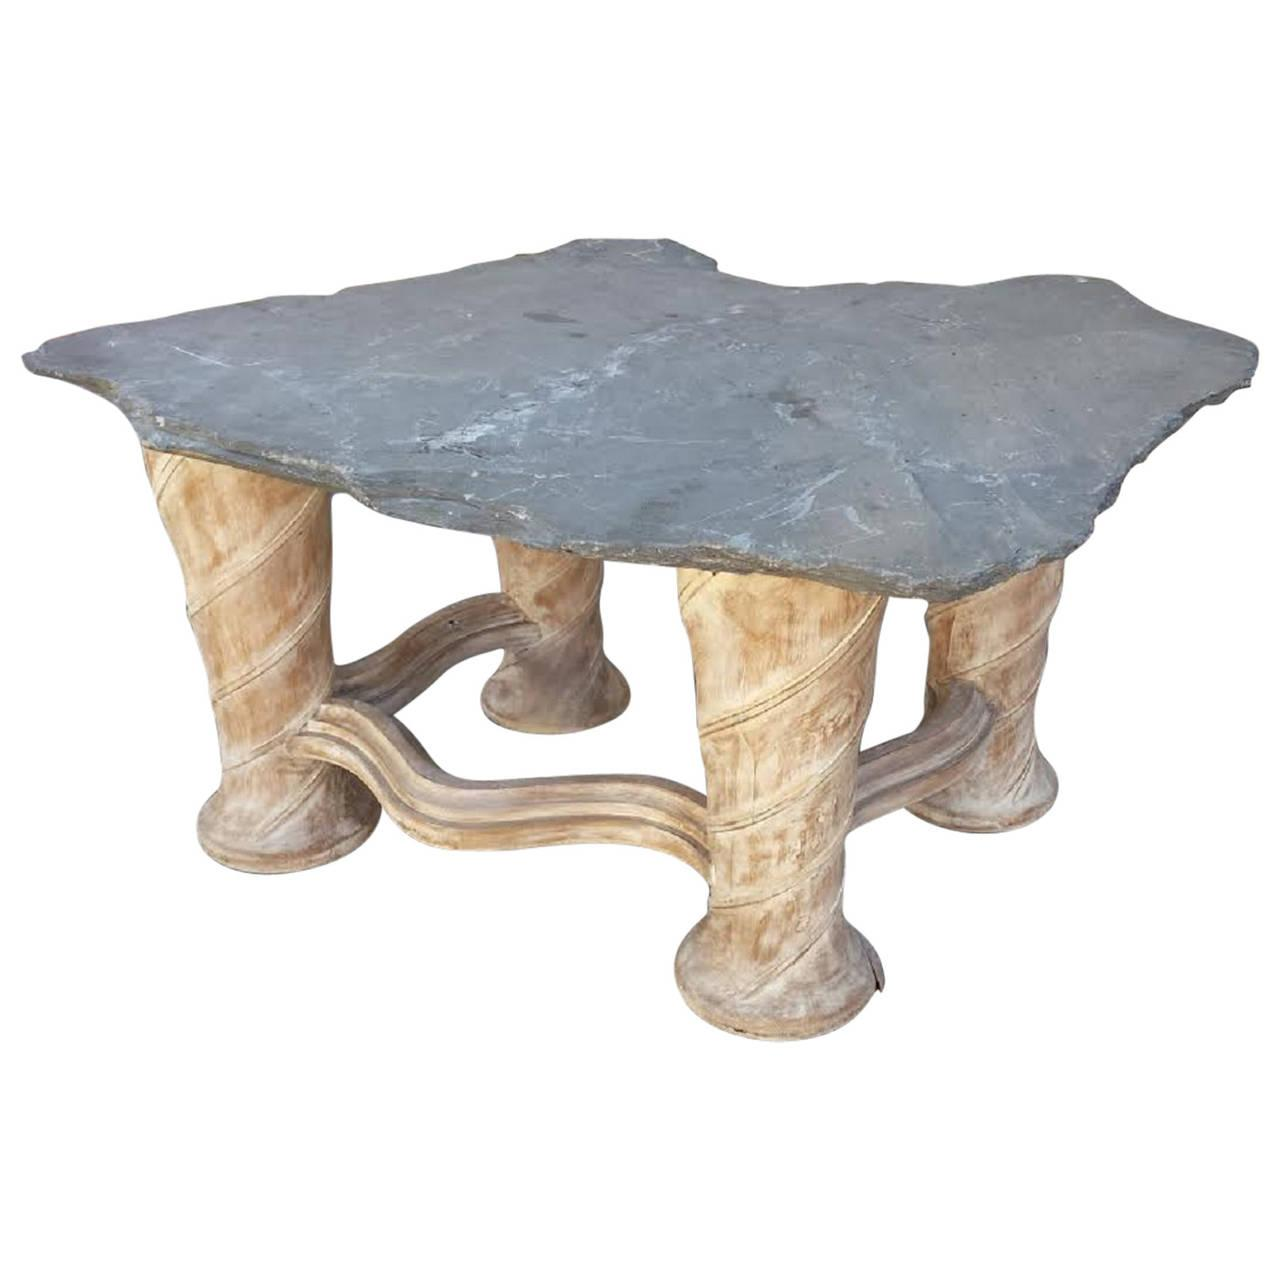 Free Form Slab Slate Top U0026 Wood Base Table   Image 1 ...